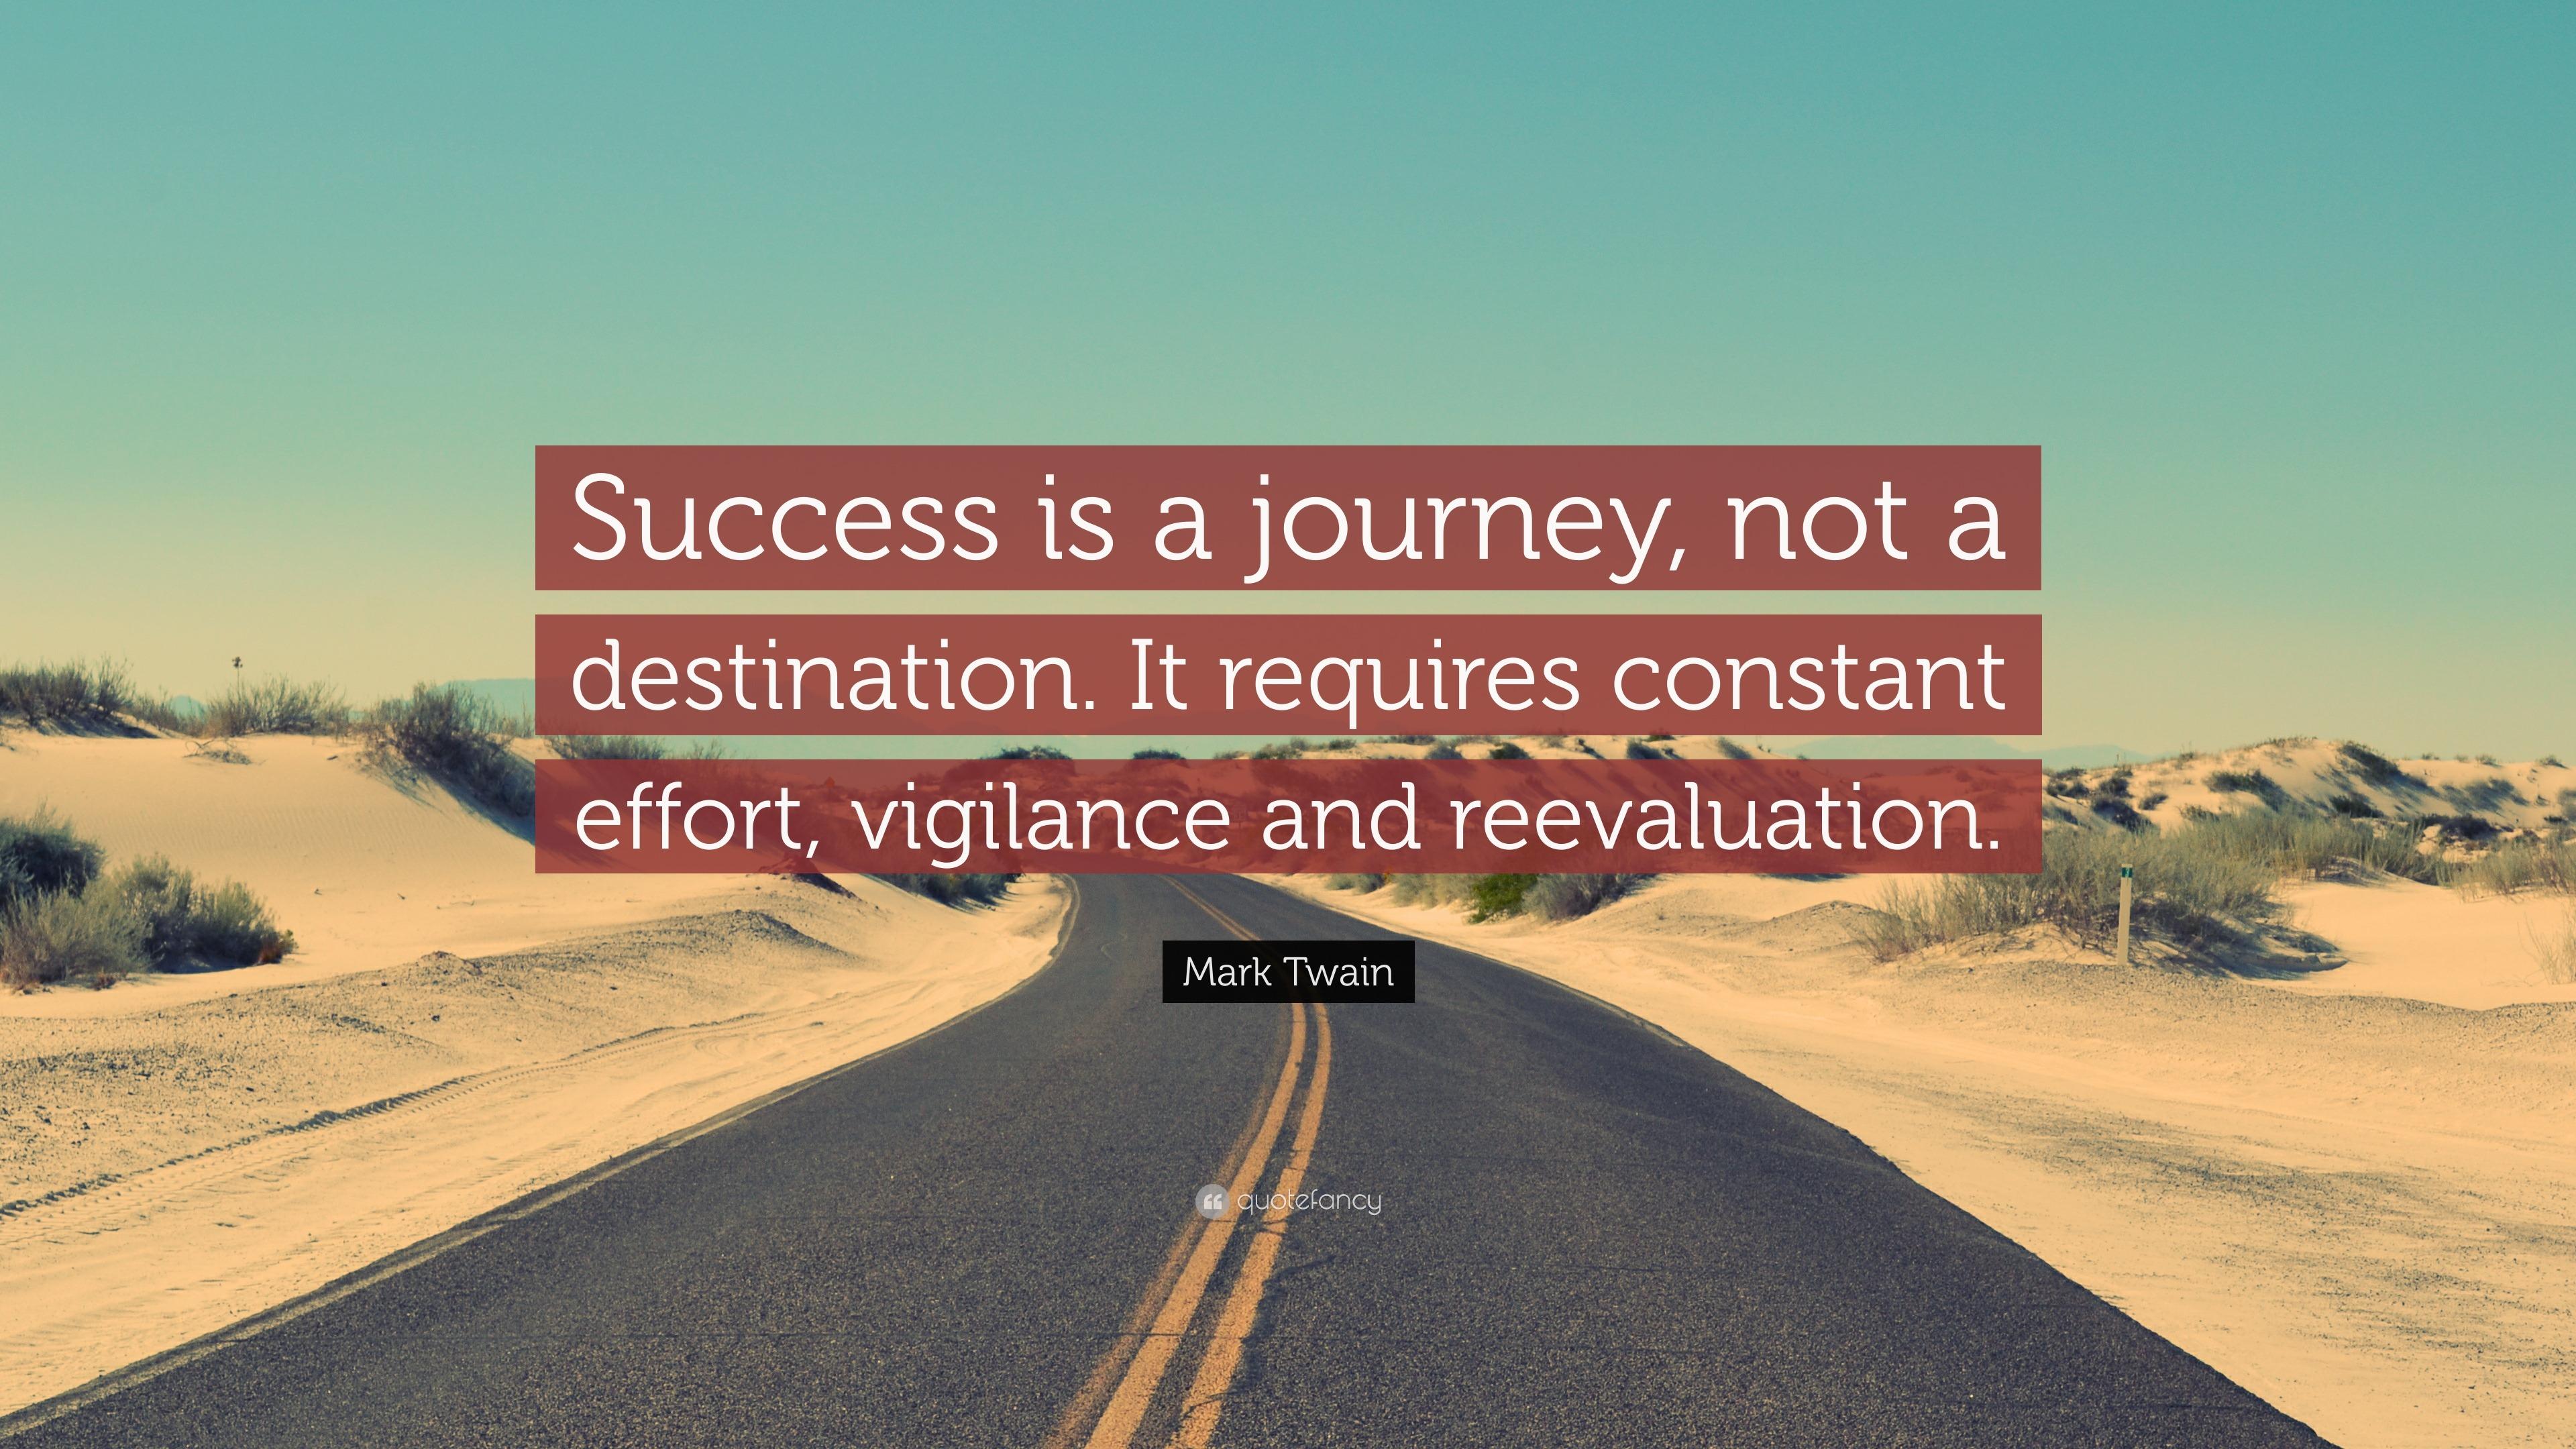 essays on success is a journey not a destination